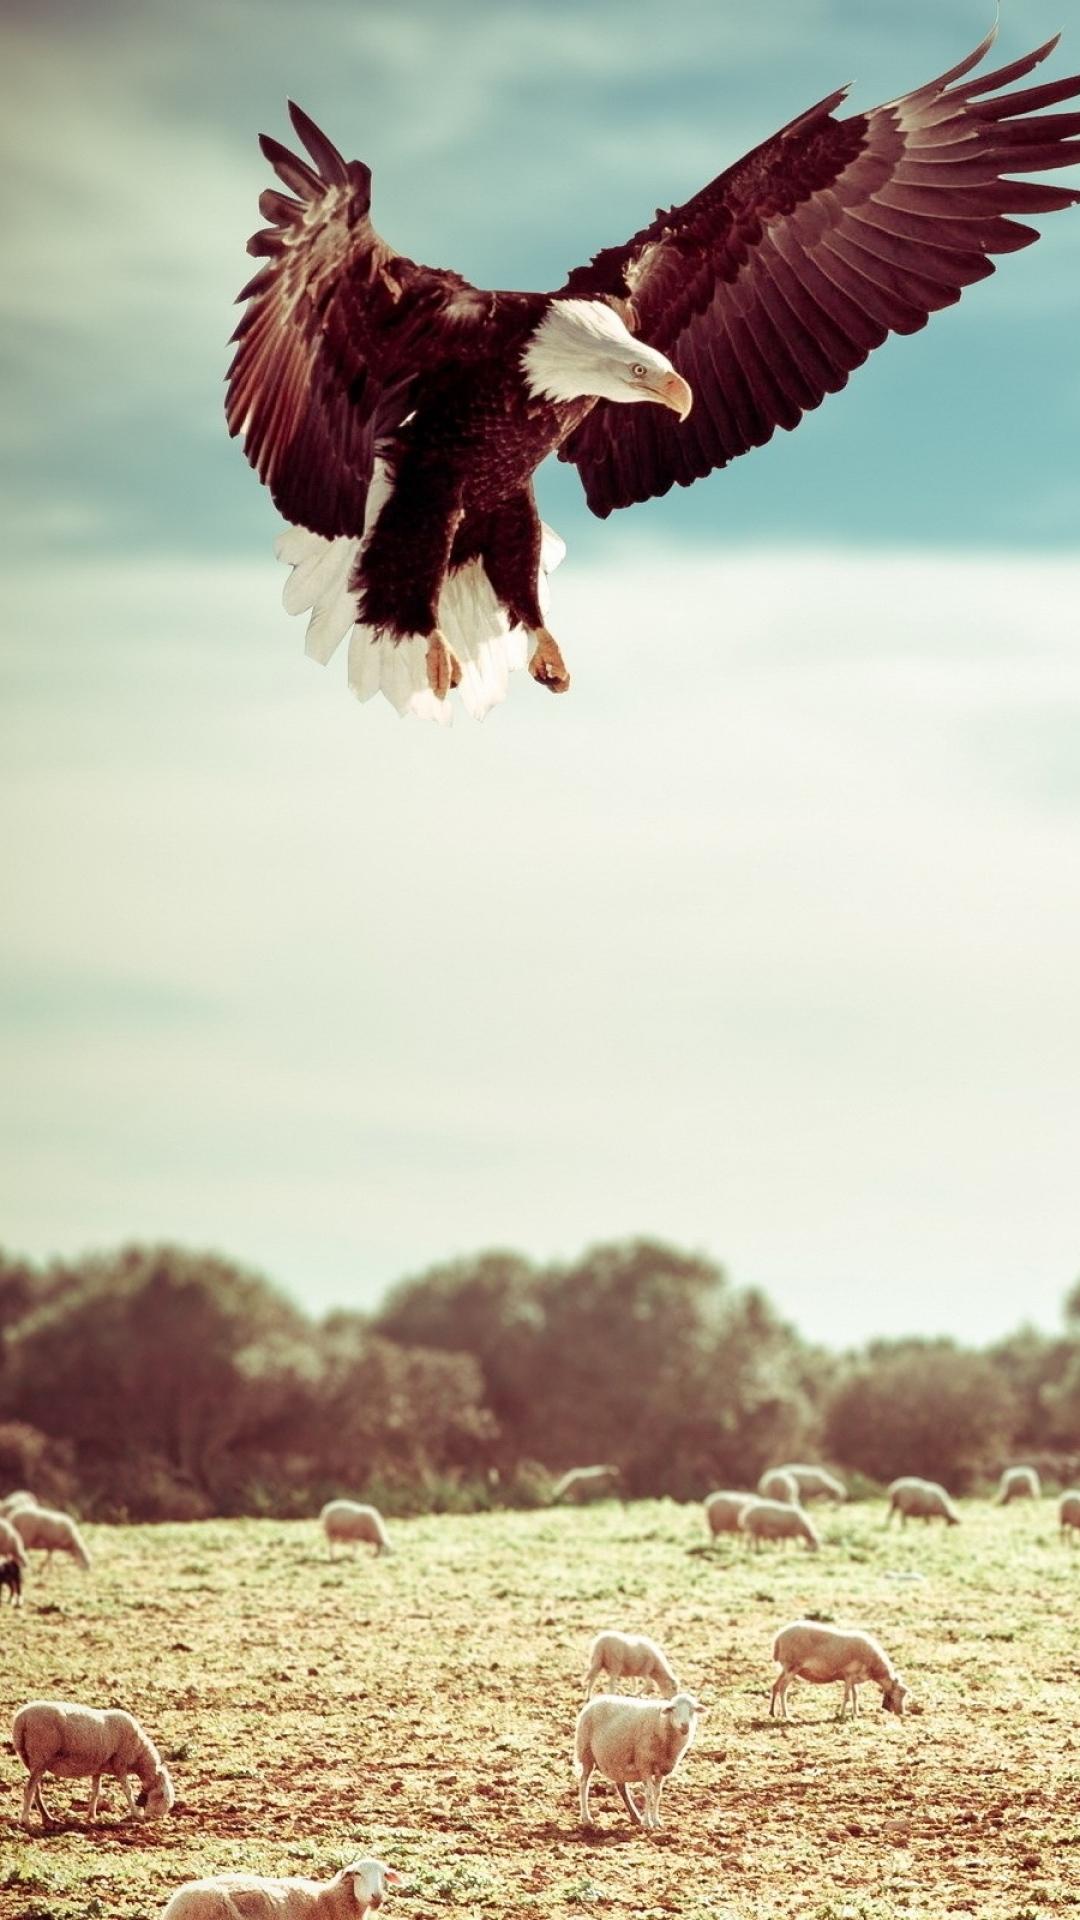 iphone wallpaper eagle field Eagle